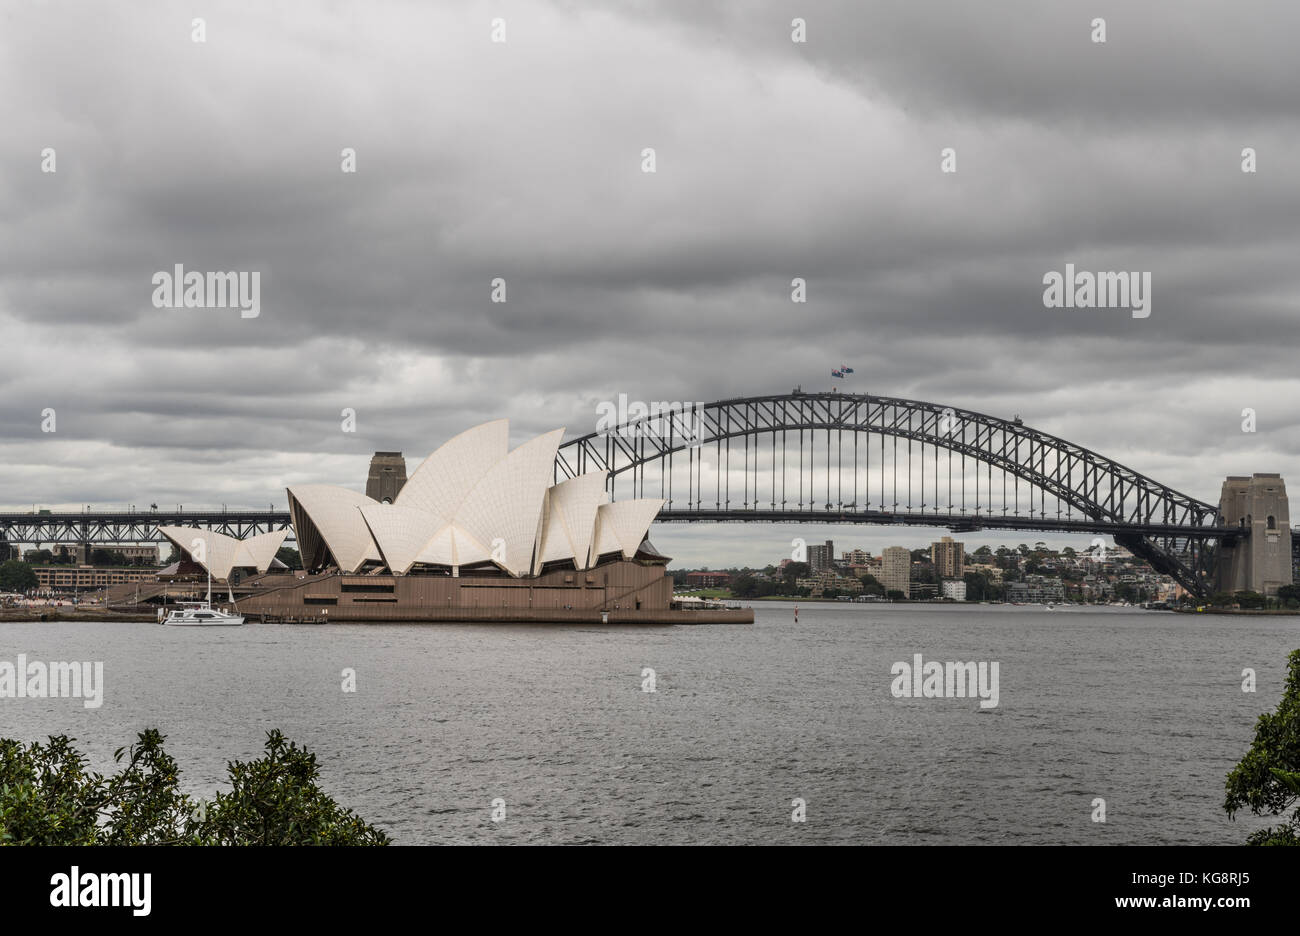 Sydney, Australia - March 23, 2017: White Opera House and black bow of Harbour Bridge behind under heavy rainy cloudscape. - Stock Image